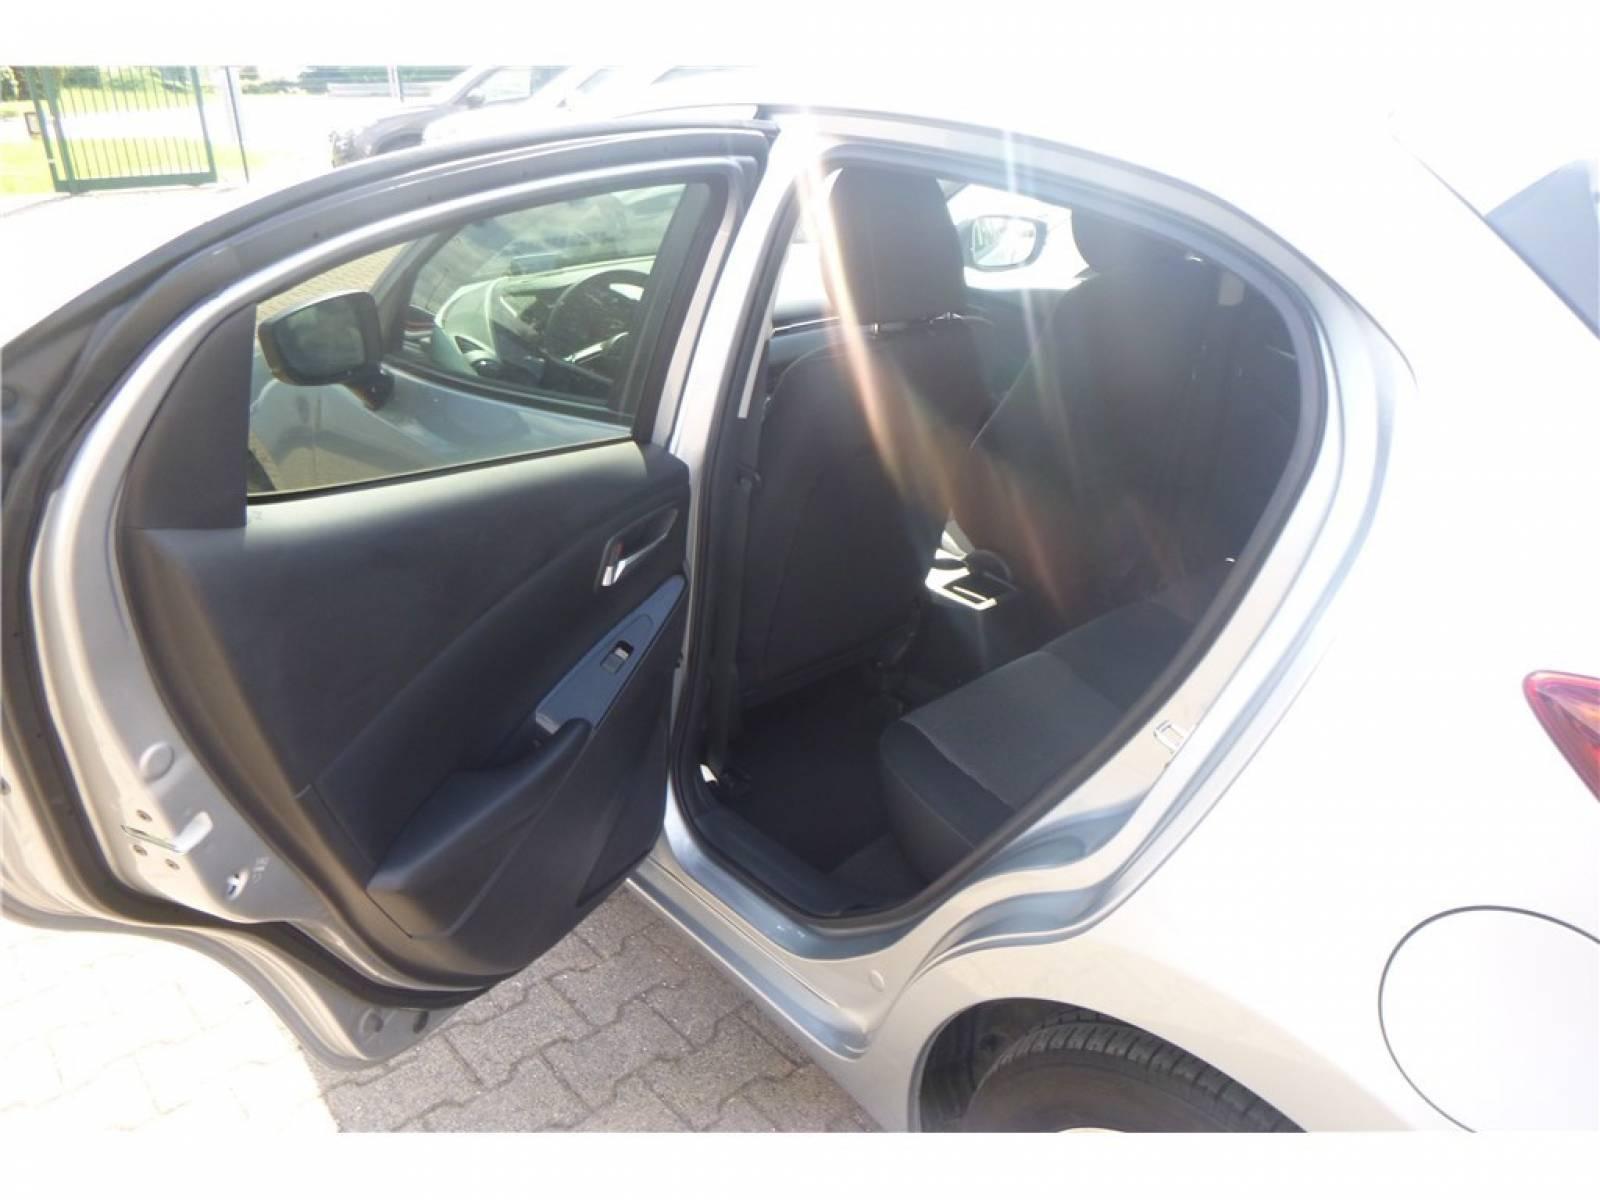 MAZDA Mazda2 1.5L SKYACTIV-G 90ch - véhicule d'occasion - Groupe Guillet - Chalon Automobiles - 71100 - Chalon-sur-Saône - 6